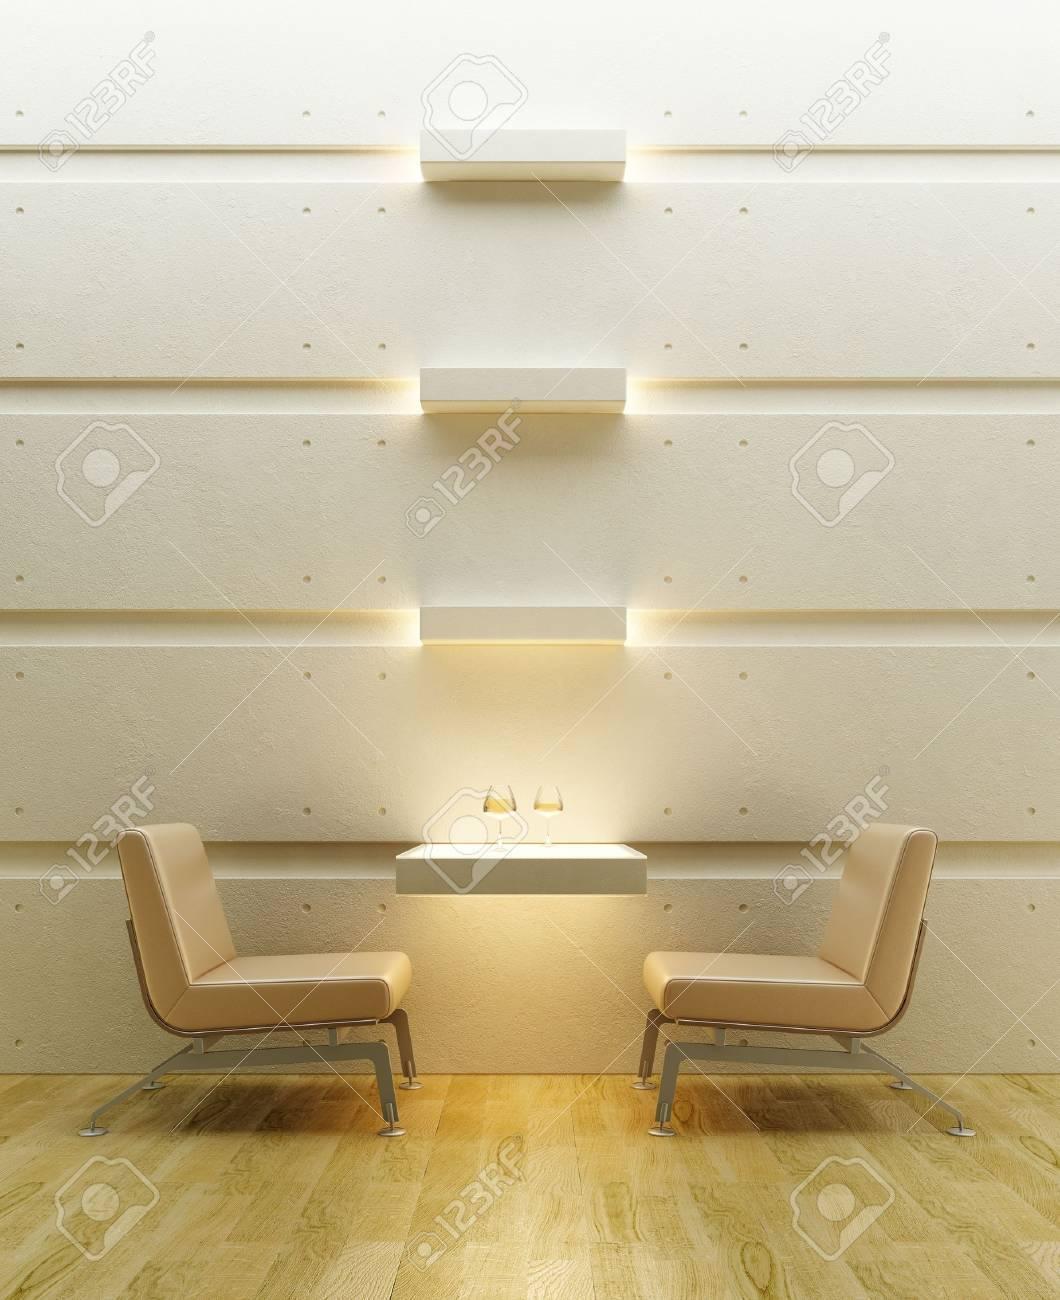 3d rendering interior lounge room Stock Photo - 5511432